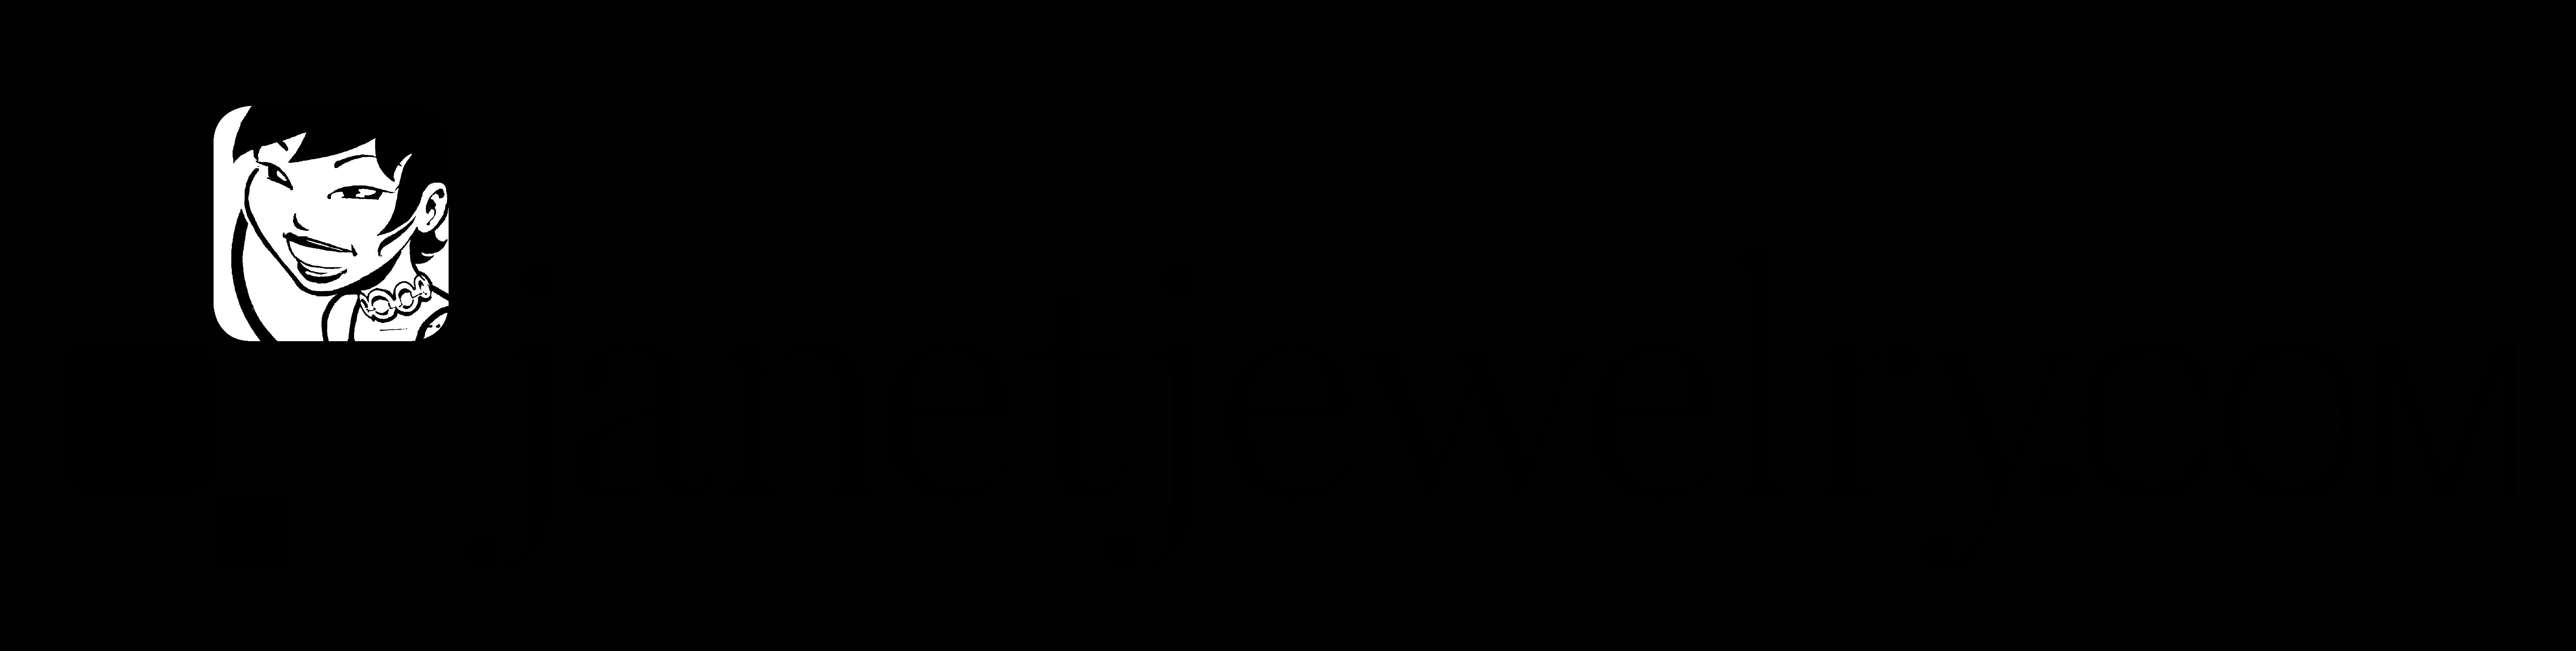 JanetJewelry Logo Black